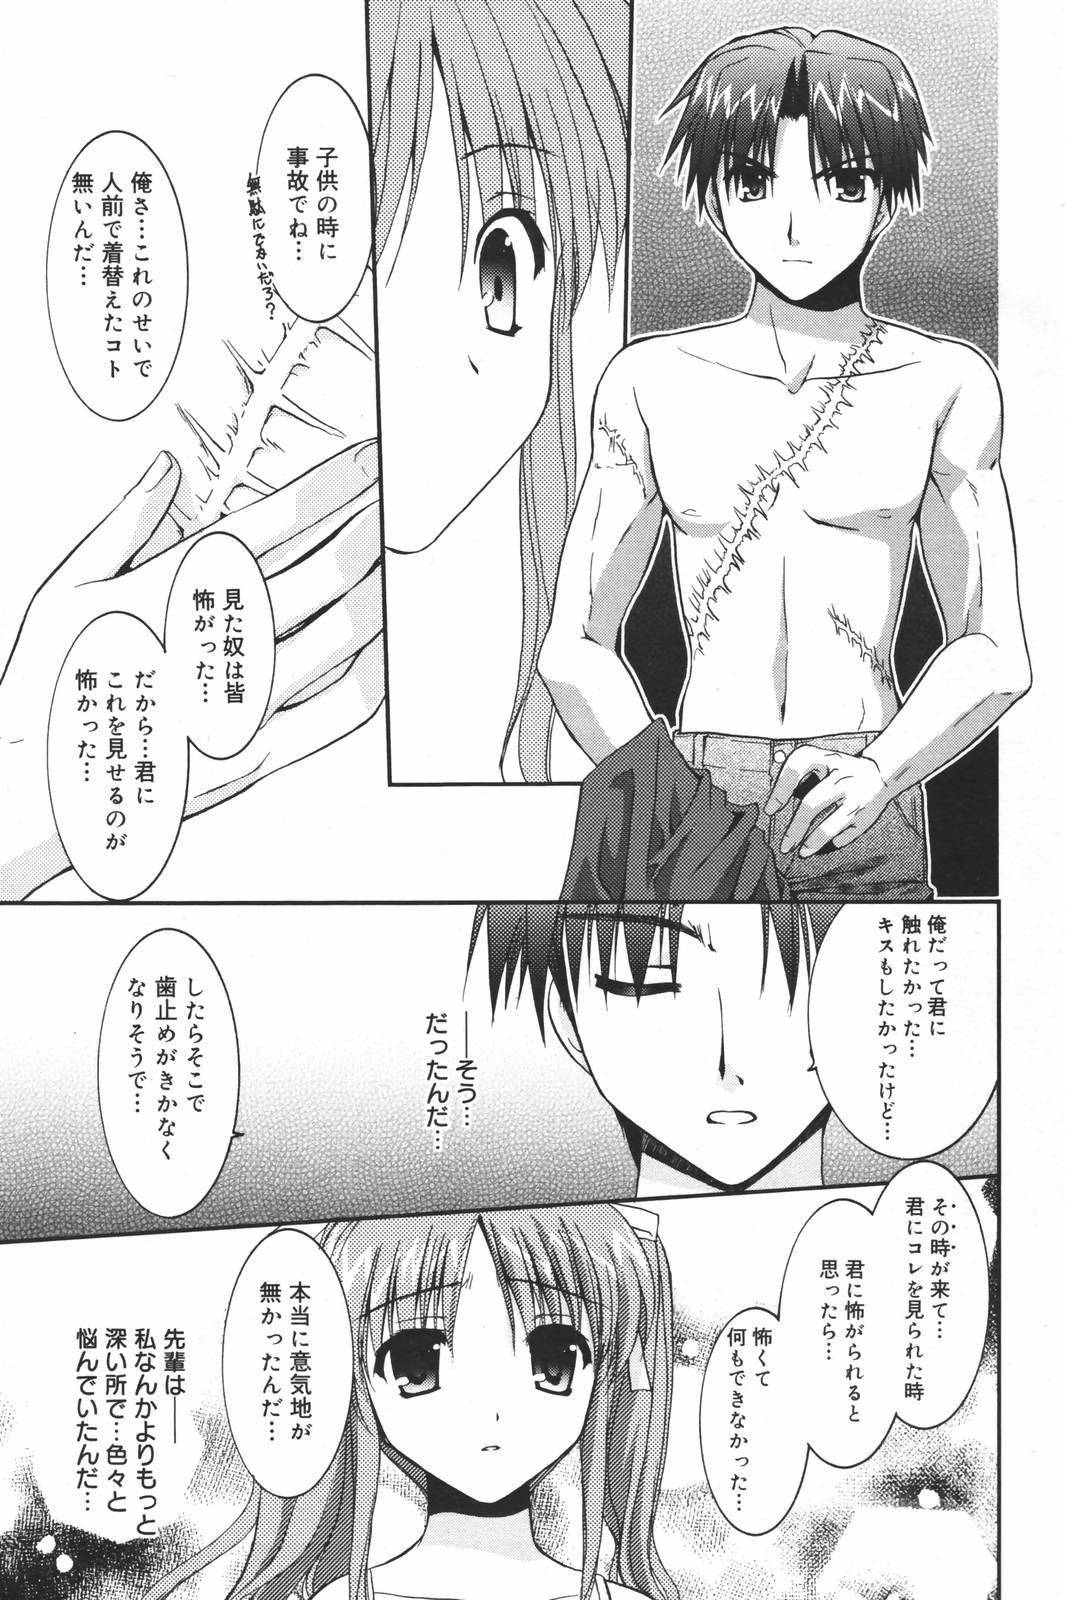 Manga Bangaichi 2007-03 44